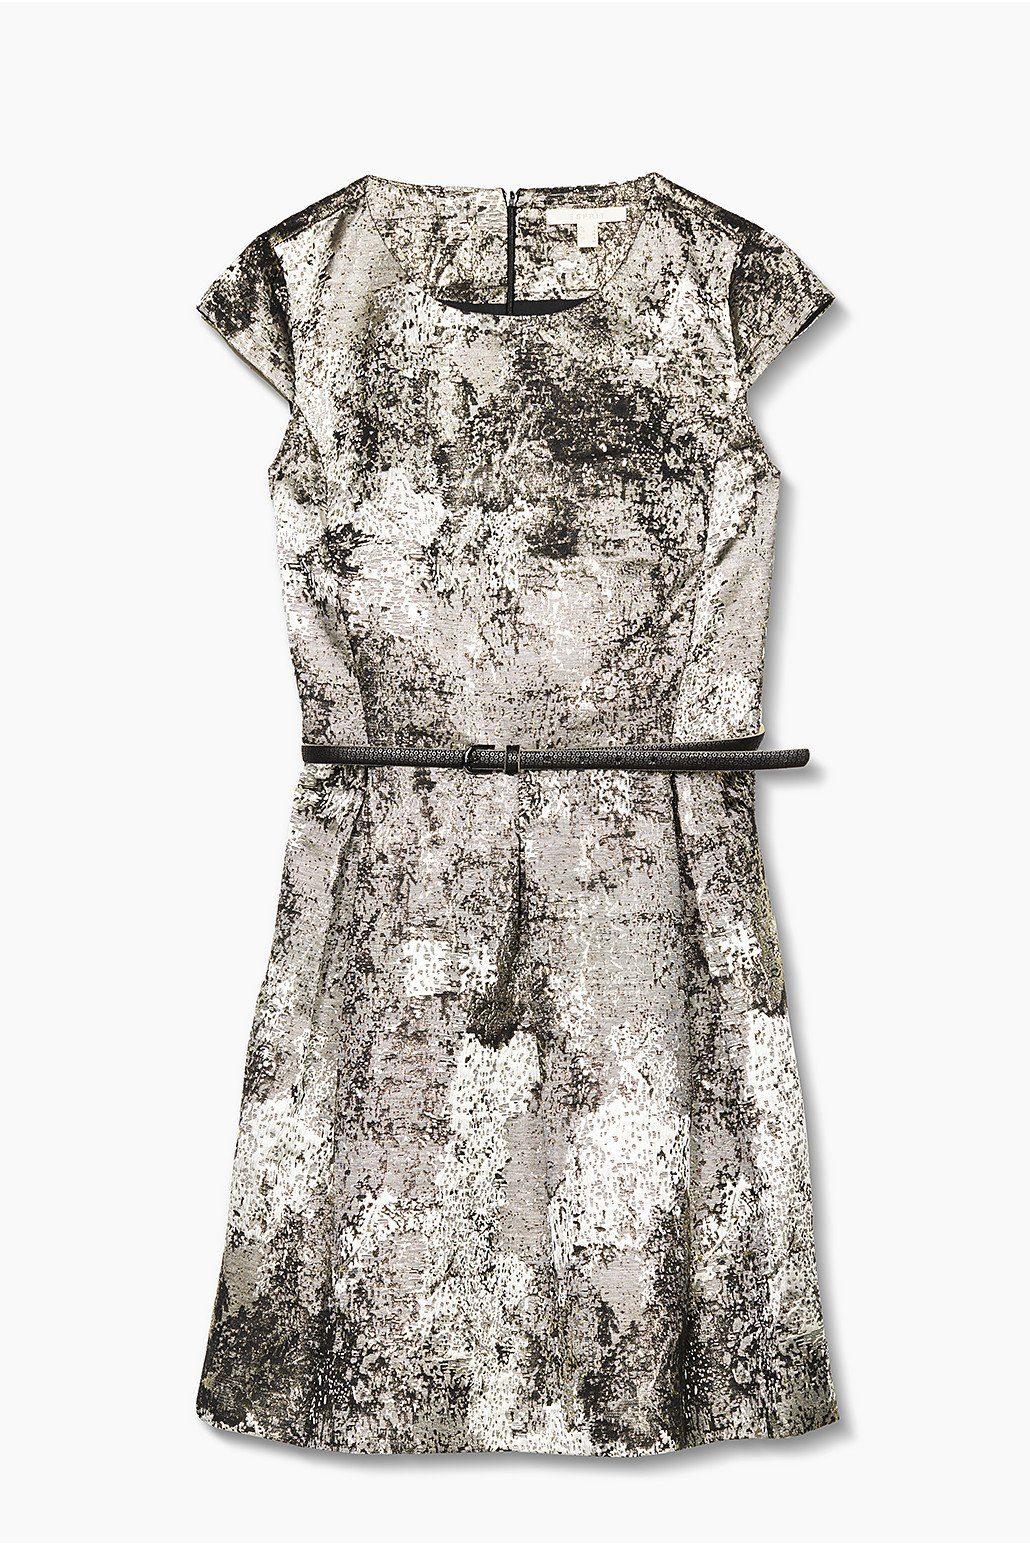 ESPRIT CASUAL Jacquard Kleid mit Glanz-Effekt